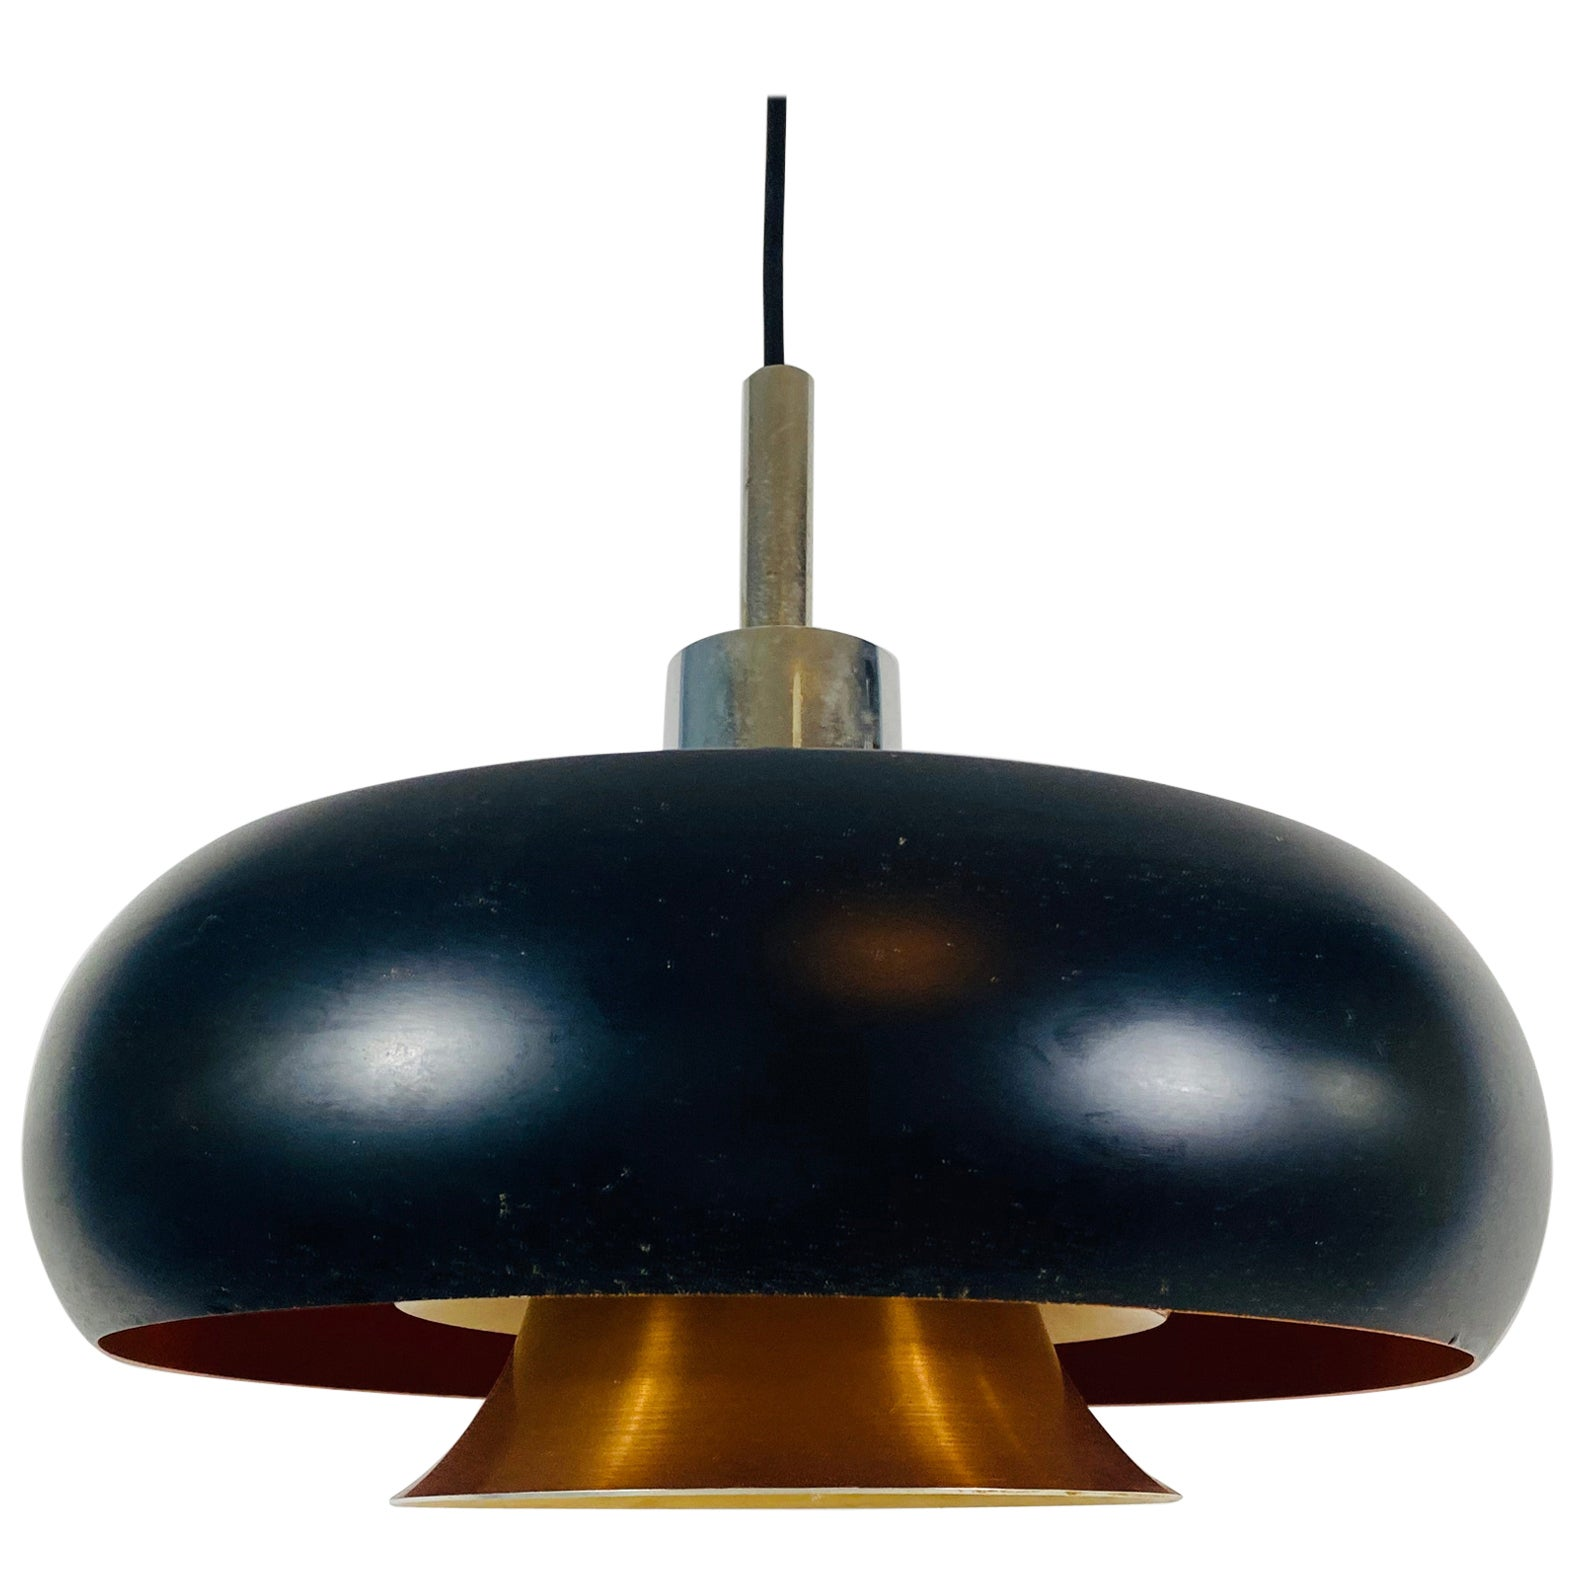 Danish Copper and Black Pendant Lamp, 1960s